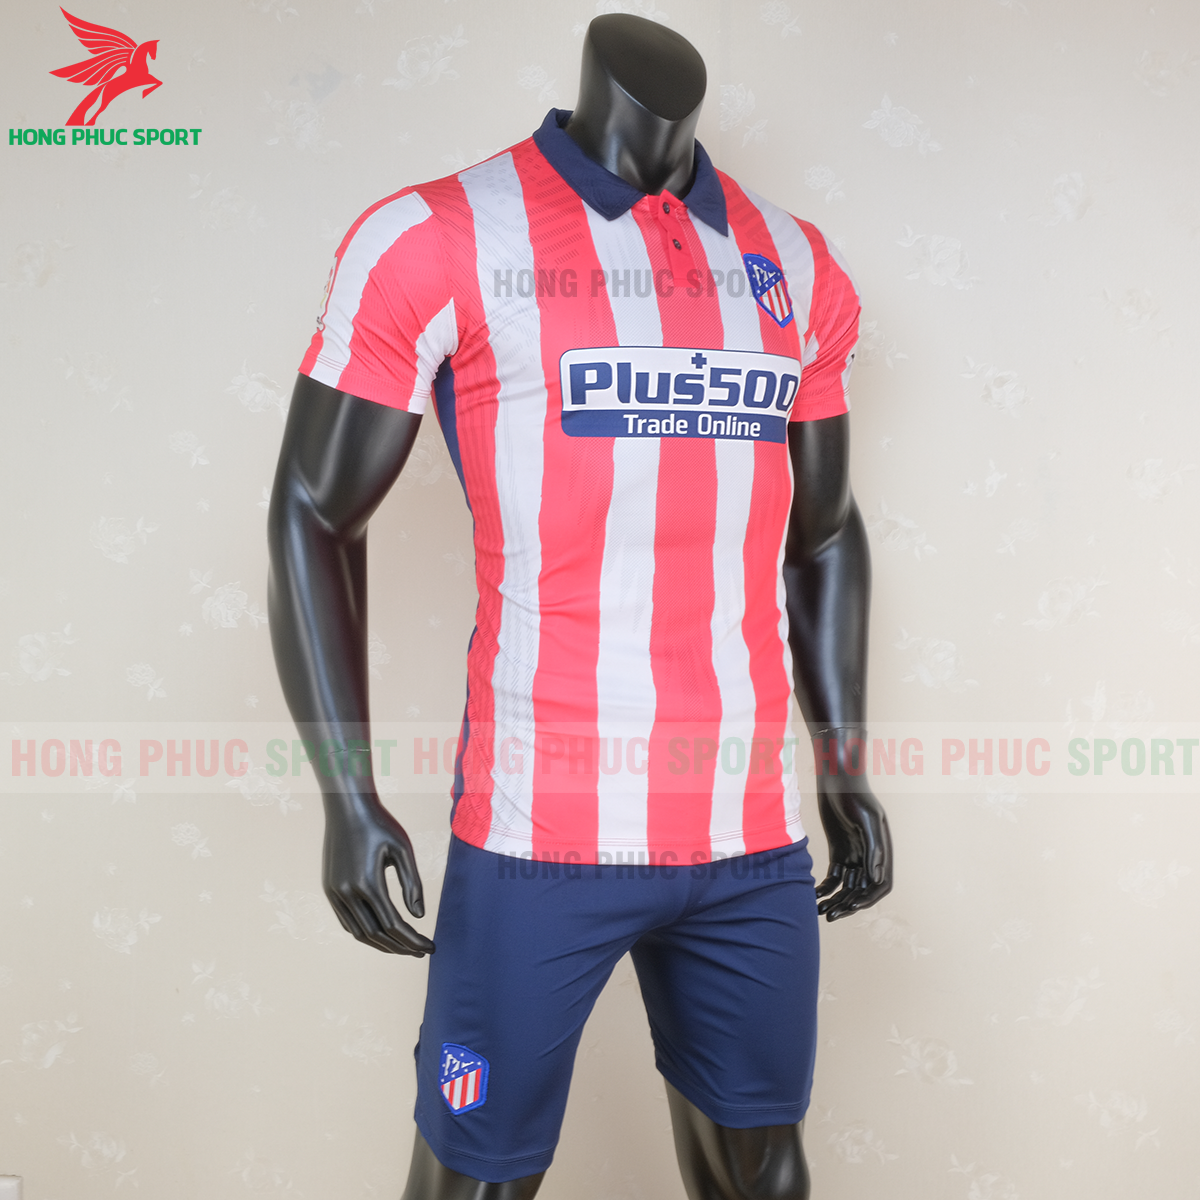 https://cdn.hongphucsport.com/unsafe/s4.shopbay.vn/files/285/ao-bong-da-atletico-madrid-2020-2021-san-nha-6-5f6c7bac11080.png